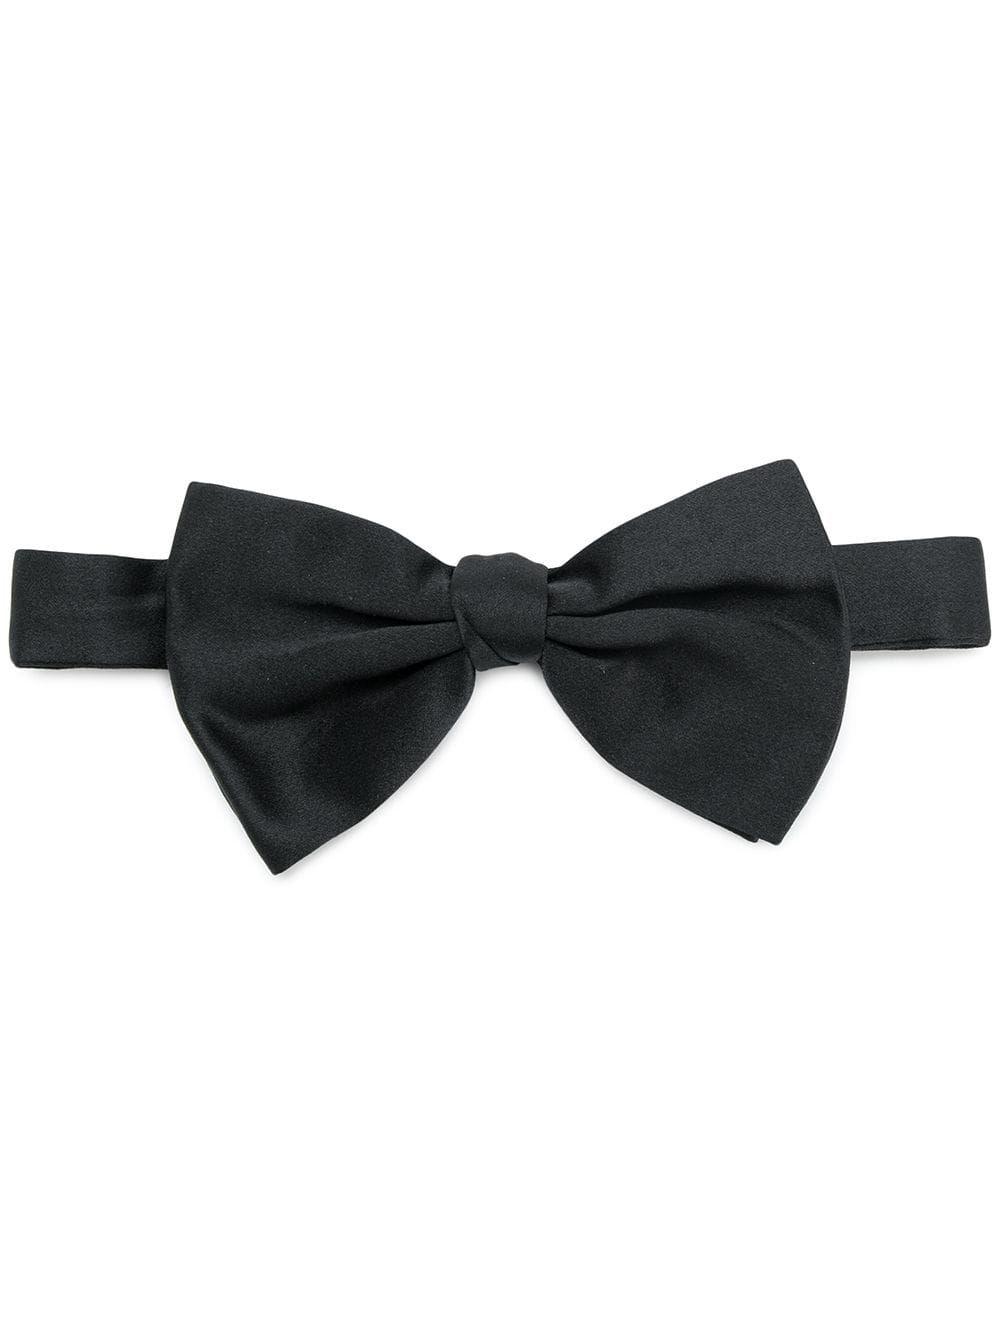 Dsquared2 classic bow tie farfetch bow tie women